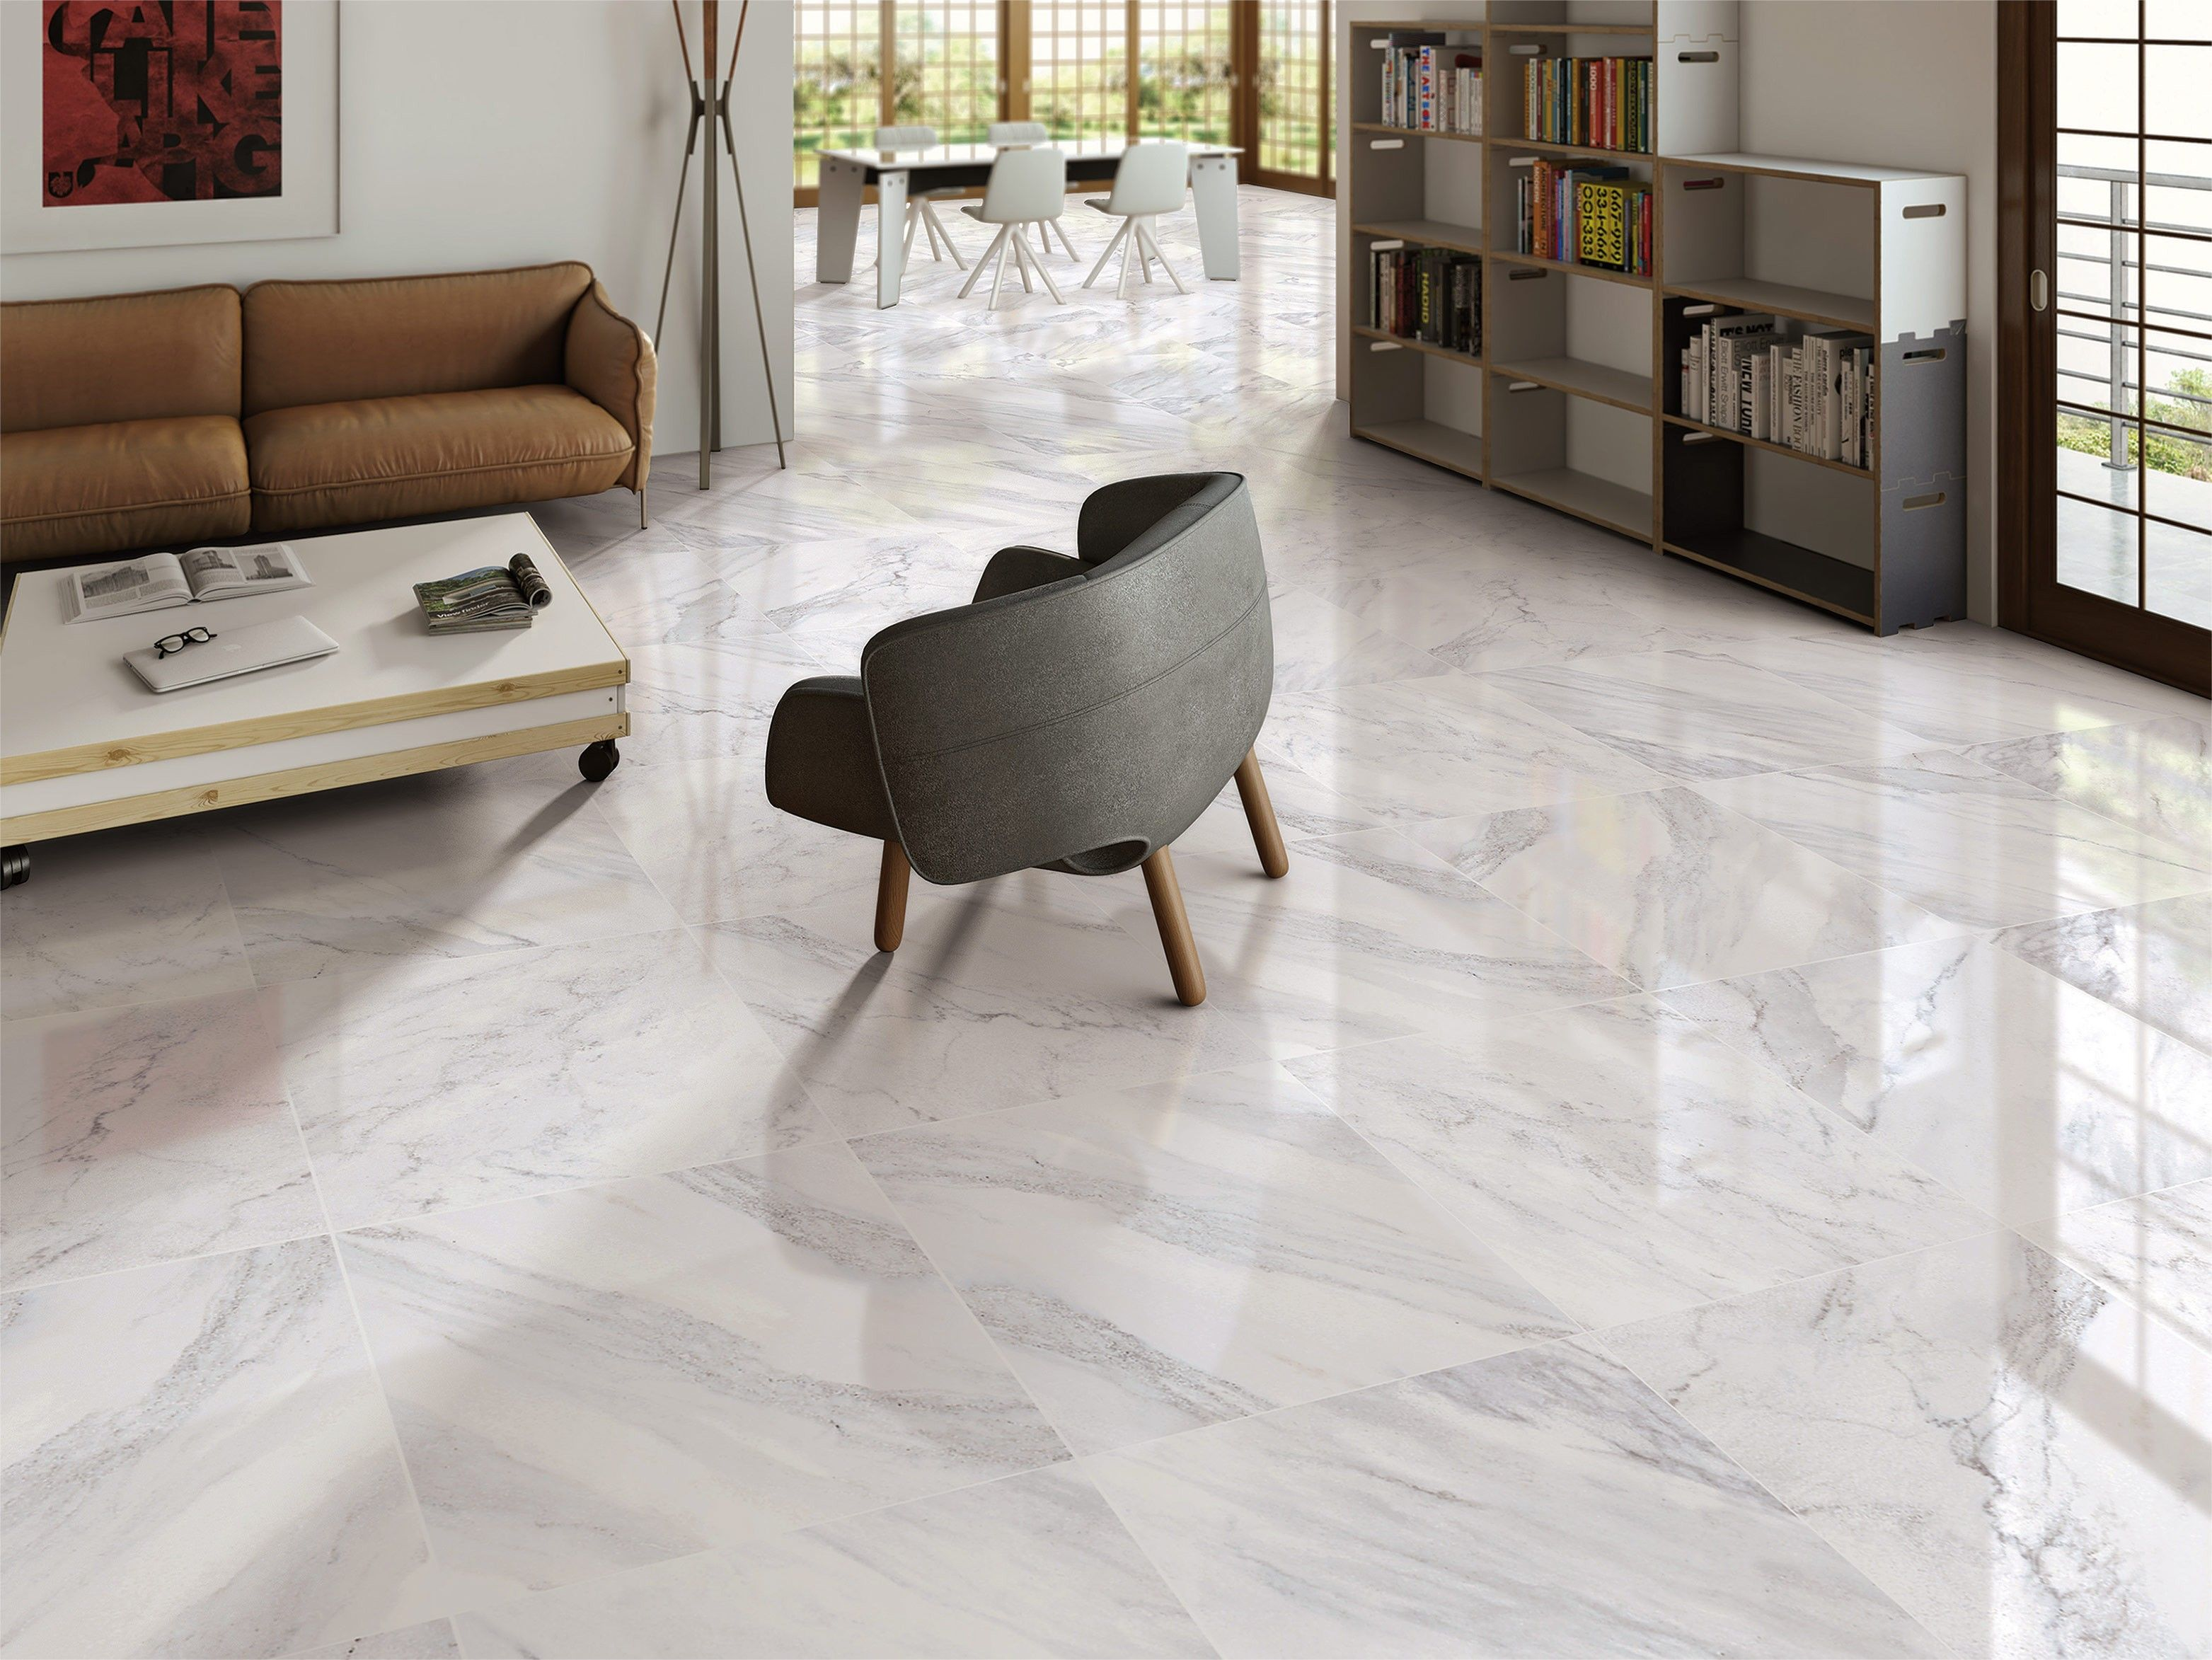 Imperial Carrara Marble Effect Porcelain Floor Tile | Carrara marble ...